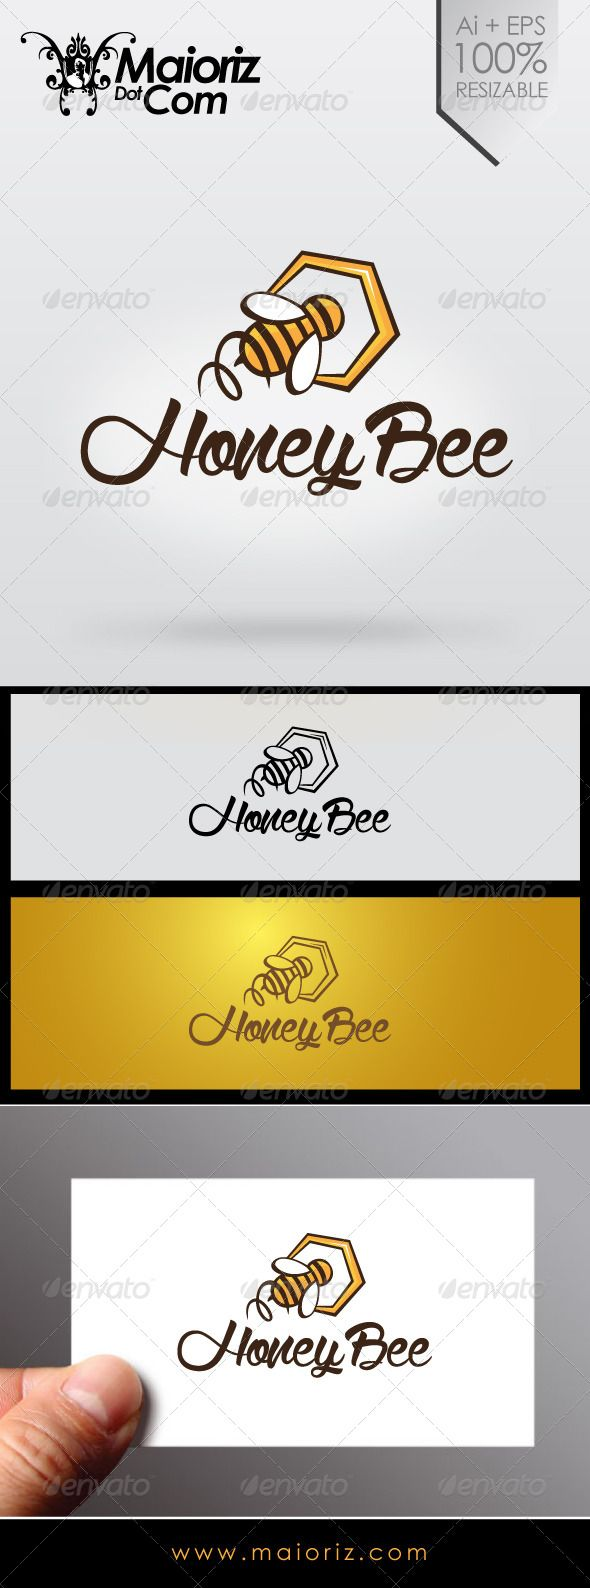 Honey Bee Logo — Transparent PNG #honey #logo • Available here → graphicri...